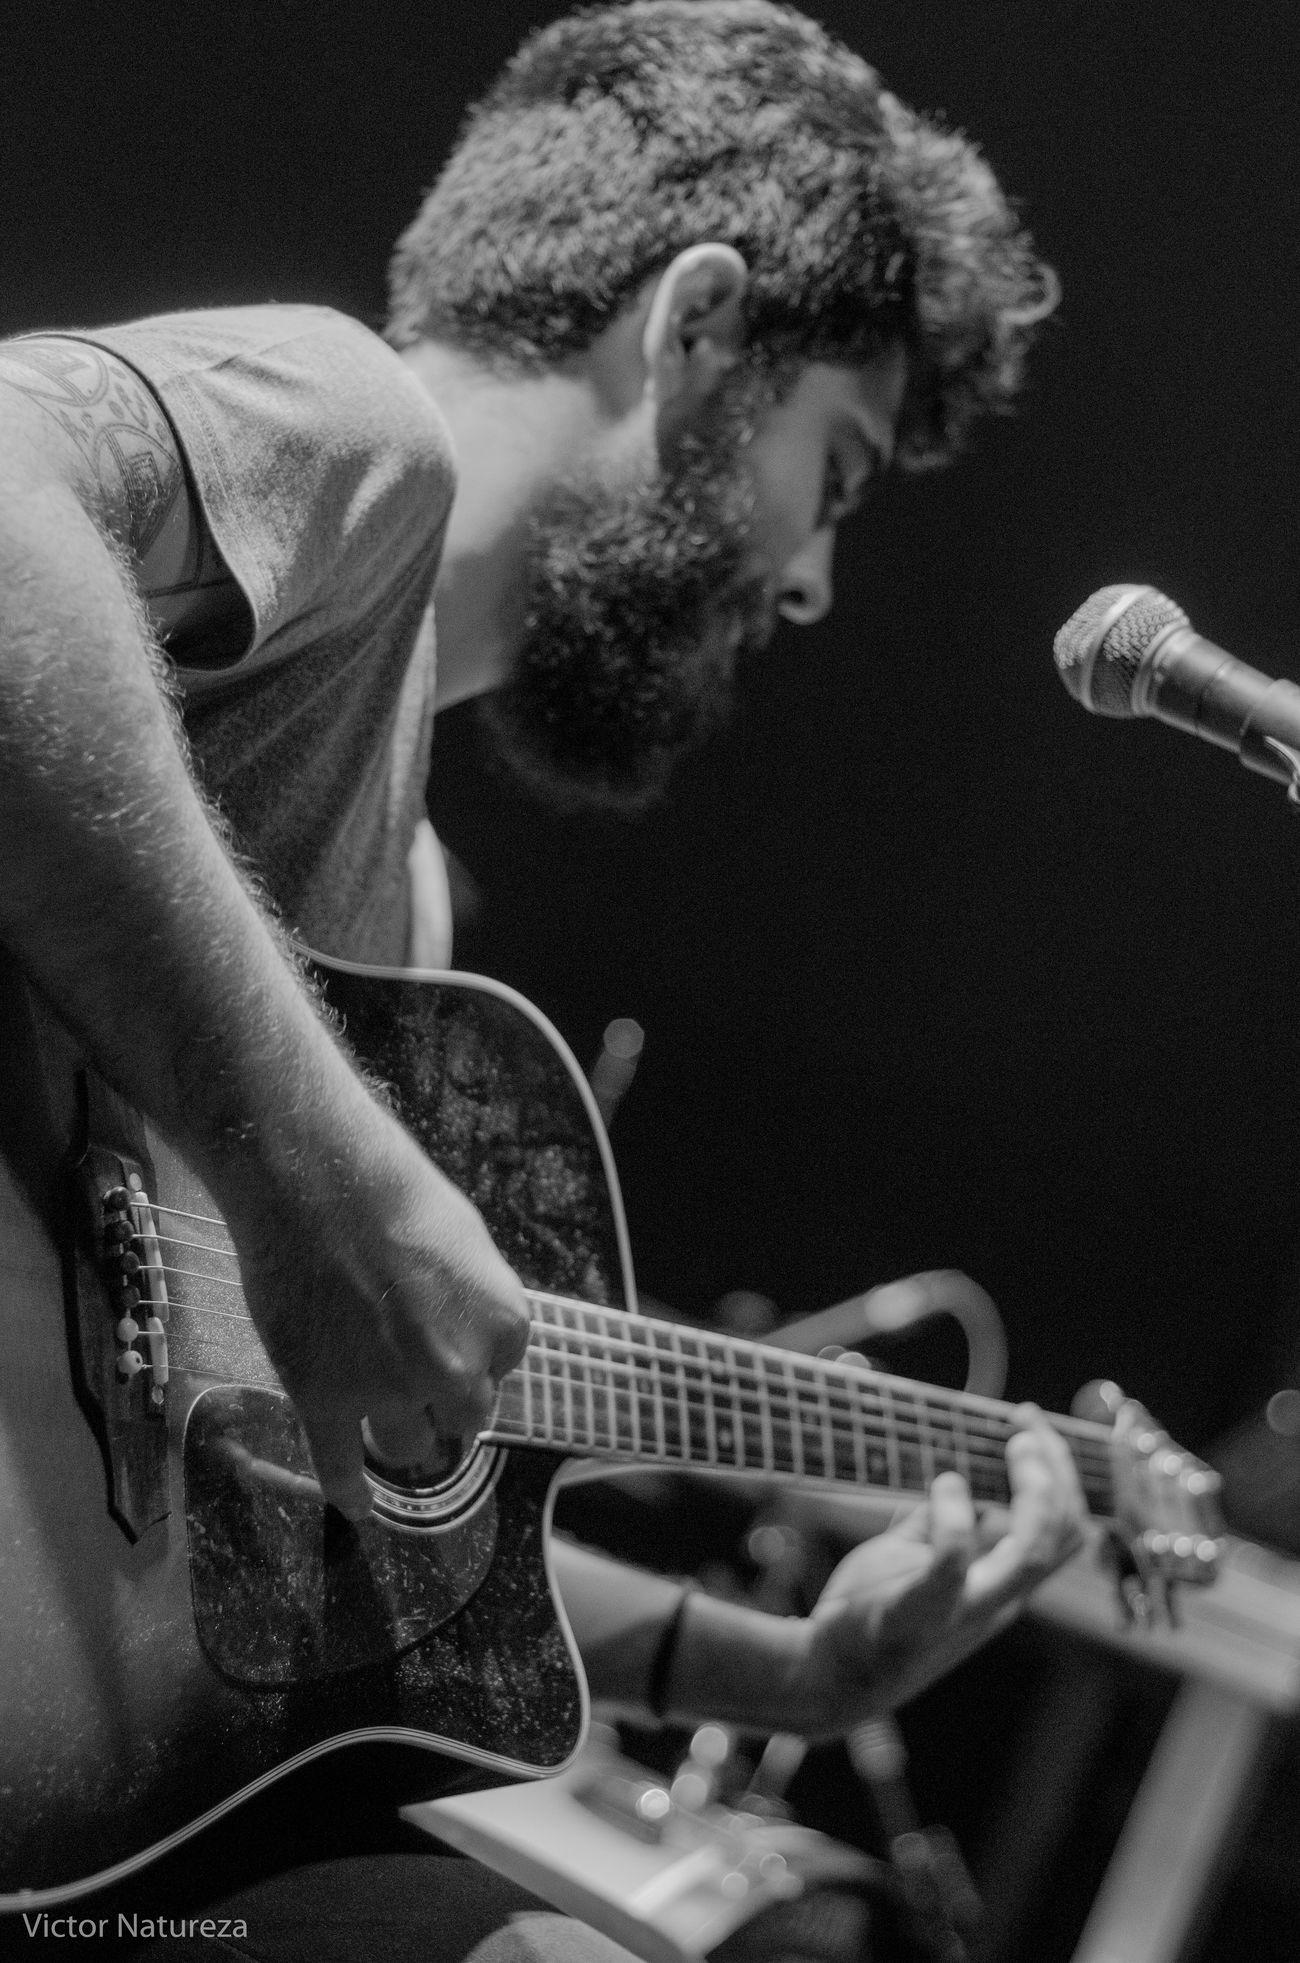 Music Loboybrujo Pb Pretoebranco Luz Sombra Victornatureza Rock Musica Vitaonatureza Olharnatural